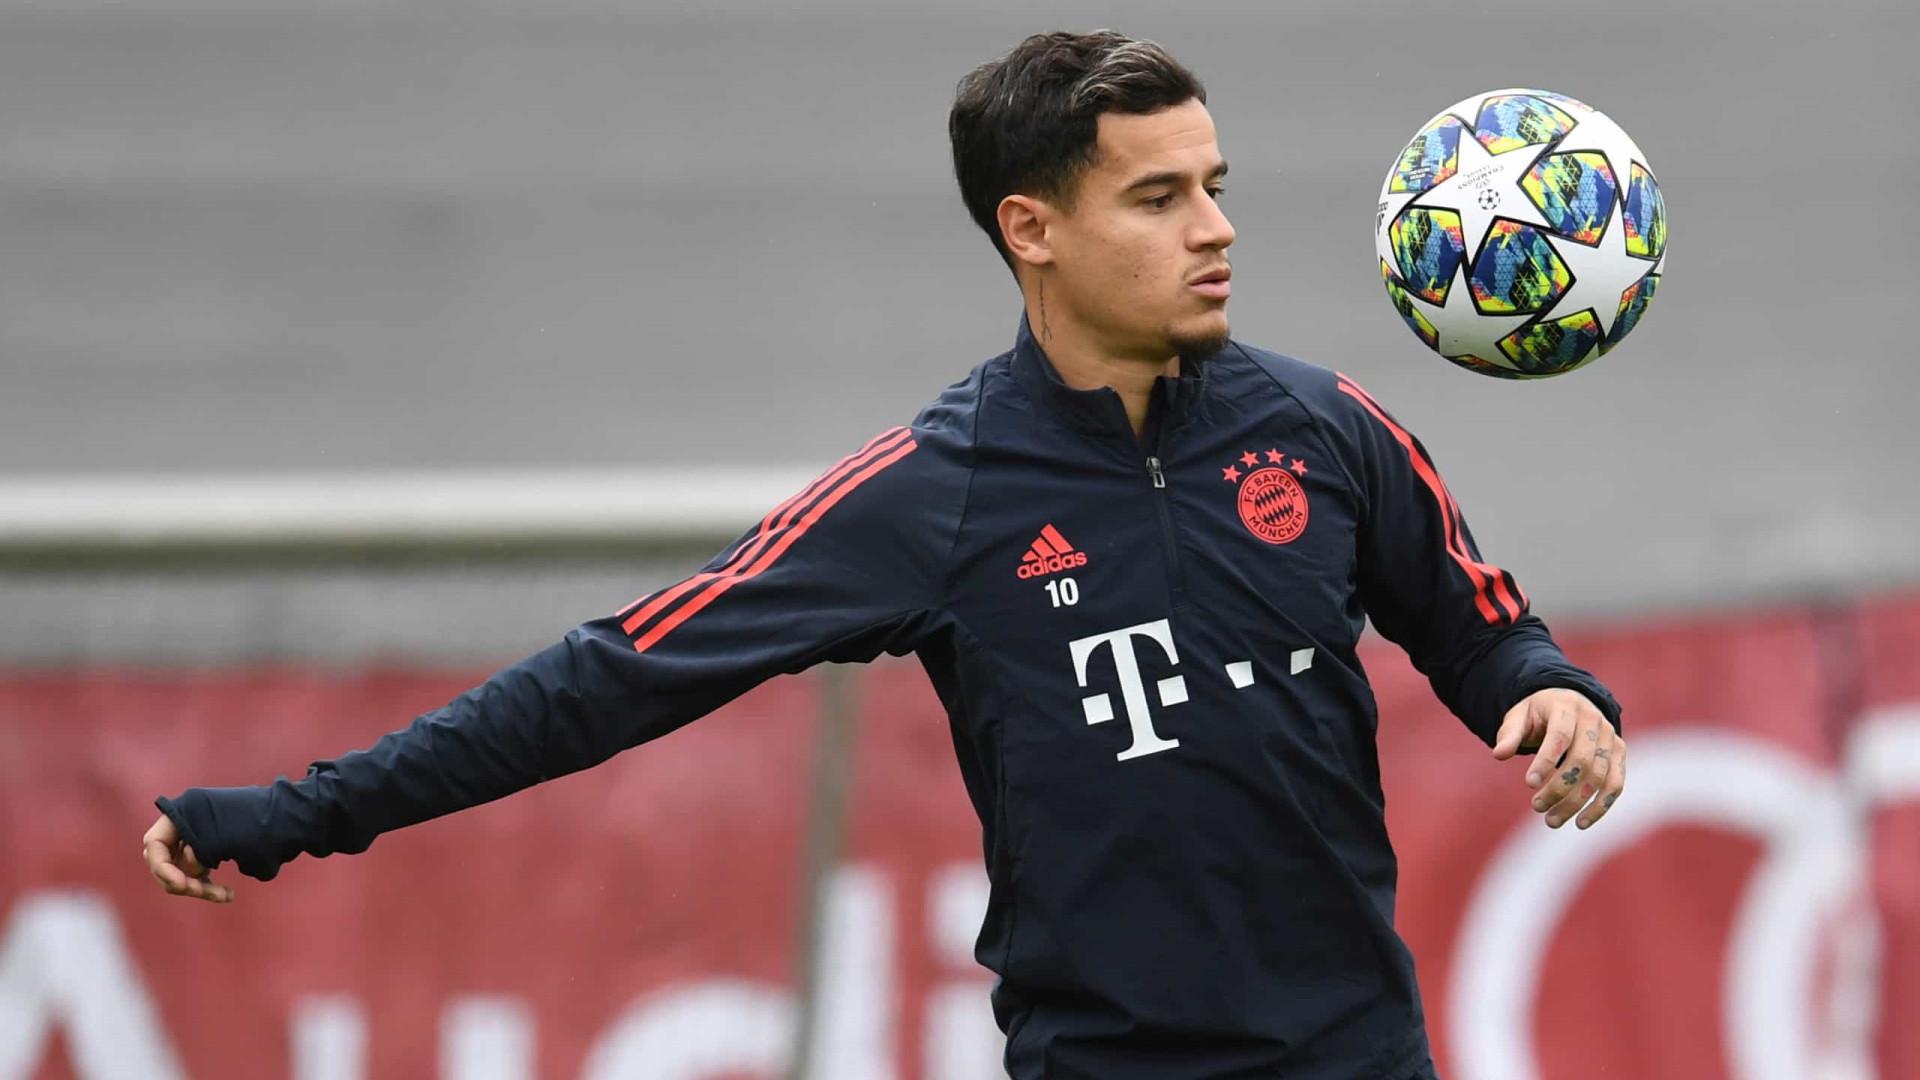 Philippe Coutinho amarga má fase no Bayern e passa ser criticado